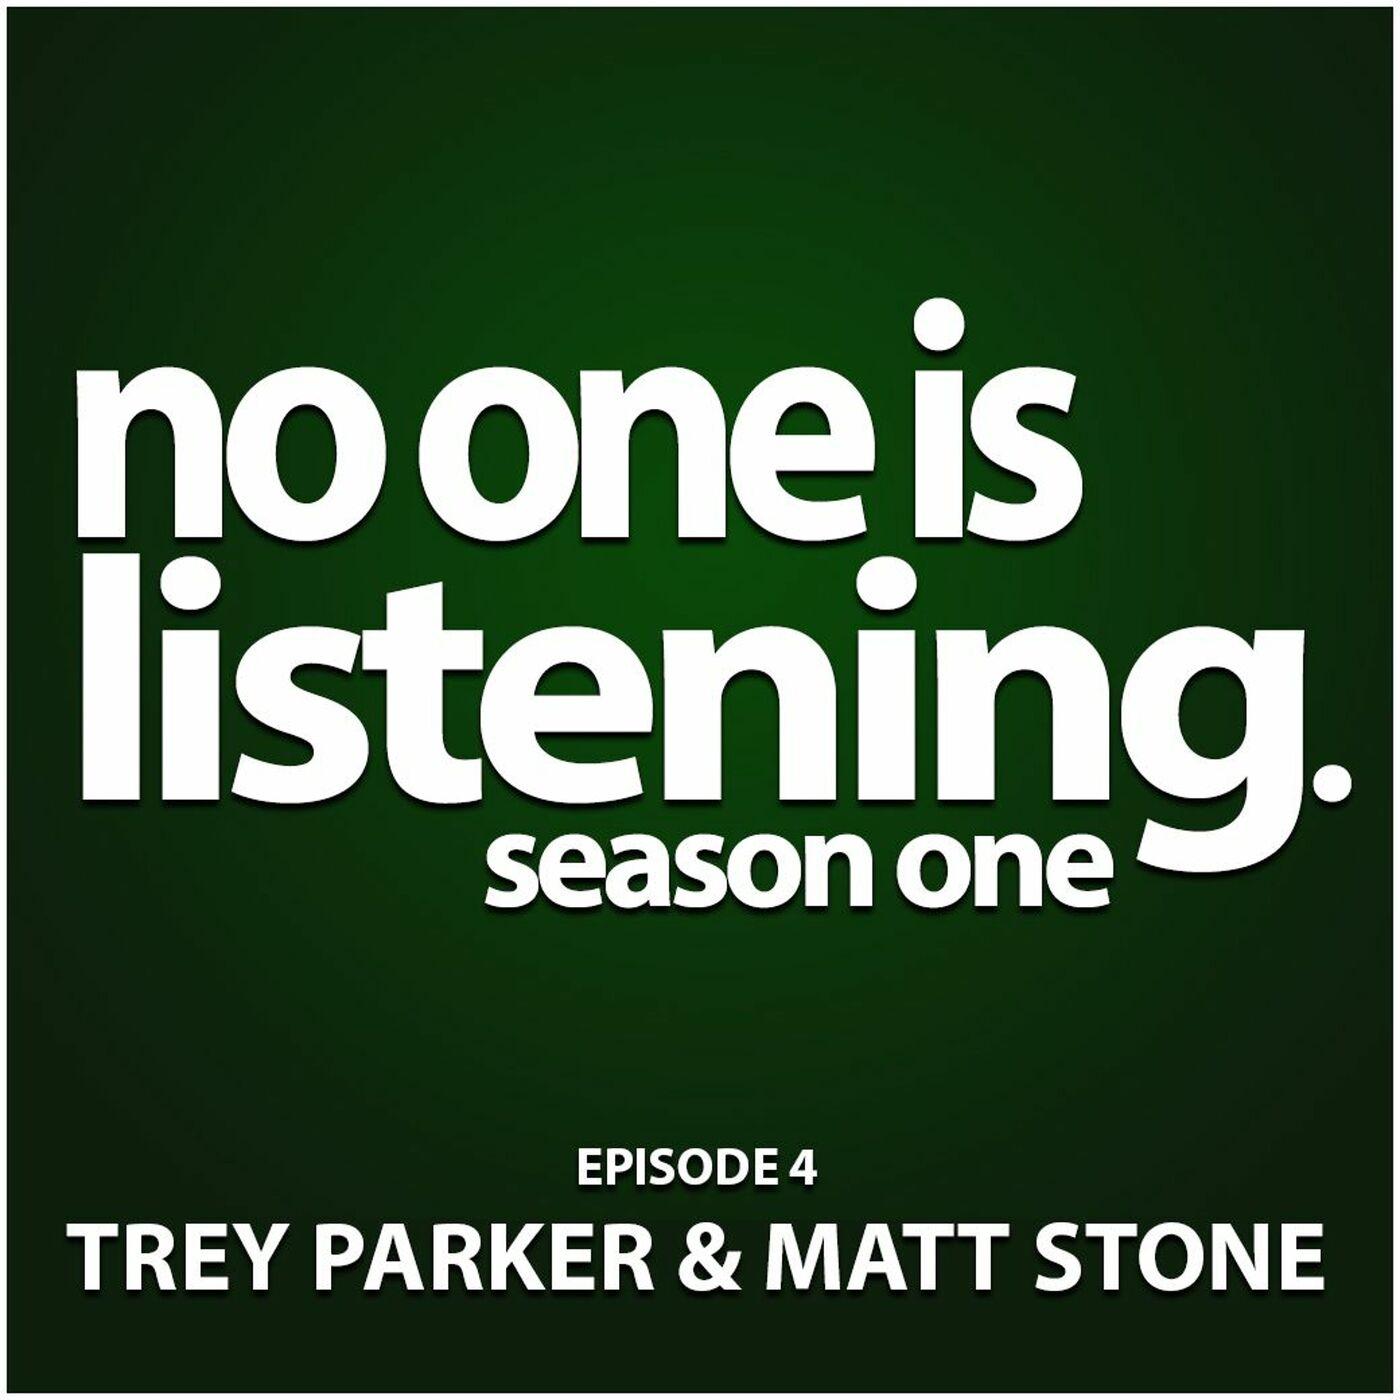 S1E4 Trey Parker and Matt Stone